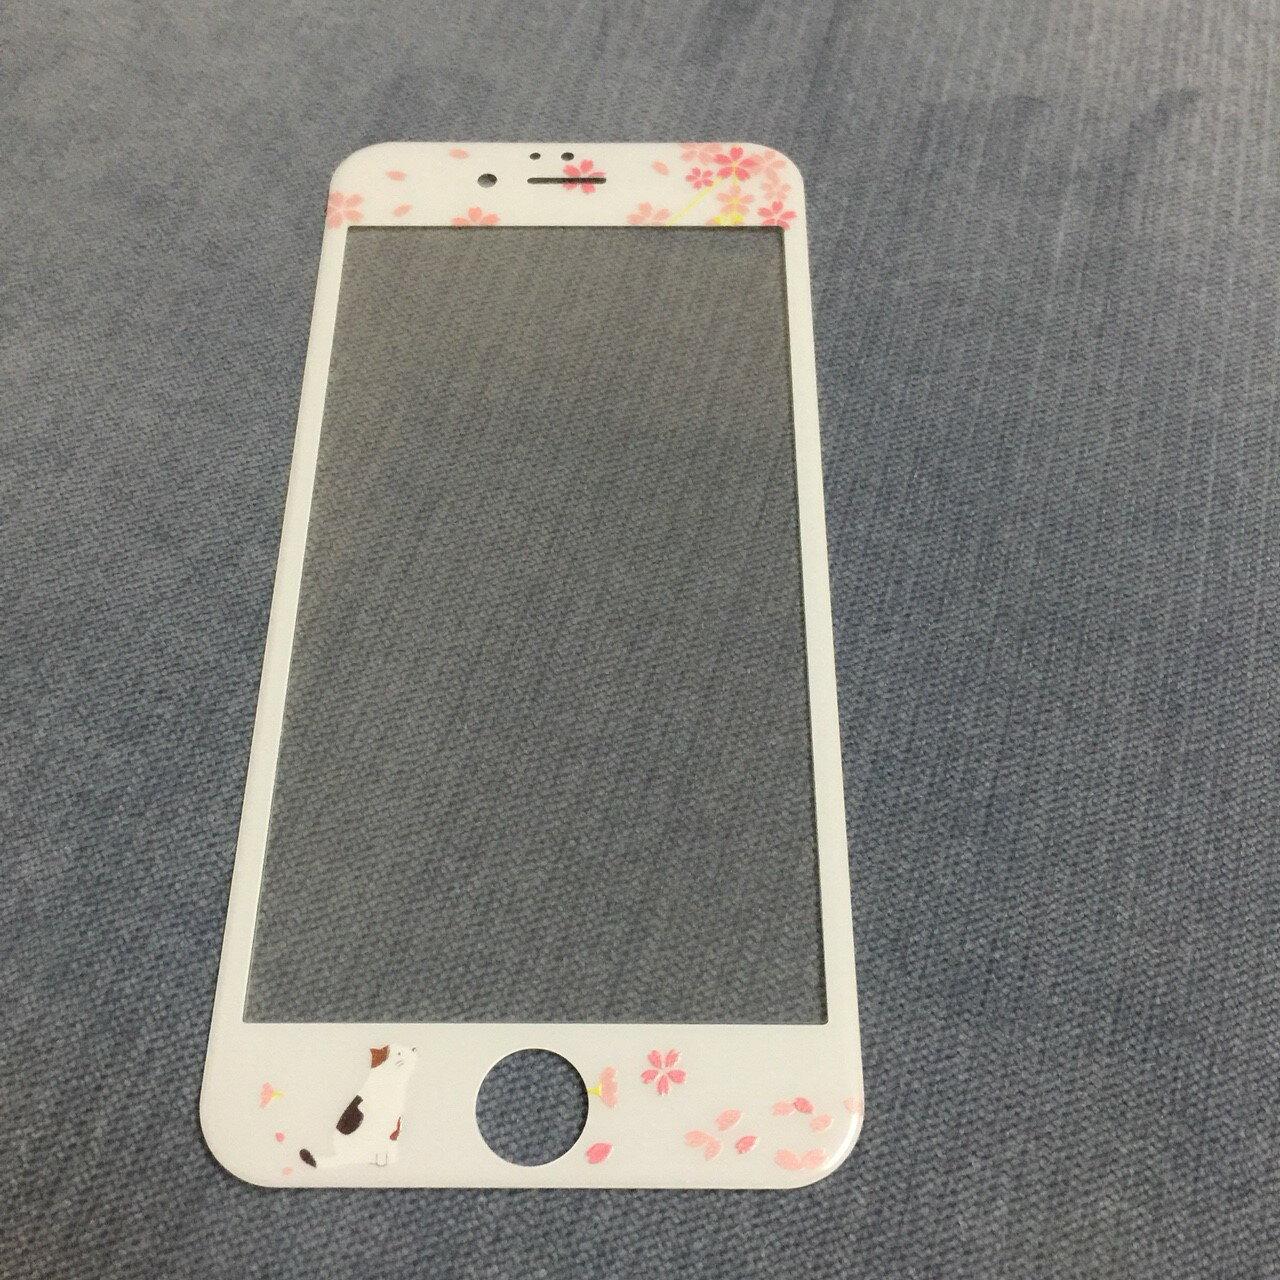 iPhone i6 I6s i6plus i7 i7plus 櫻花 全屏保護貼 3D卡通 超薄9h鋼化膜 彩膜 手機螢幕貼【GP美貼】